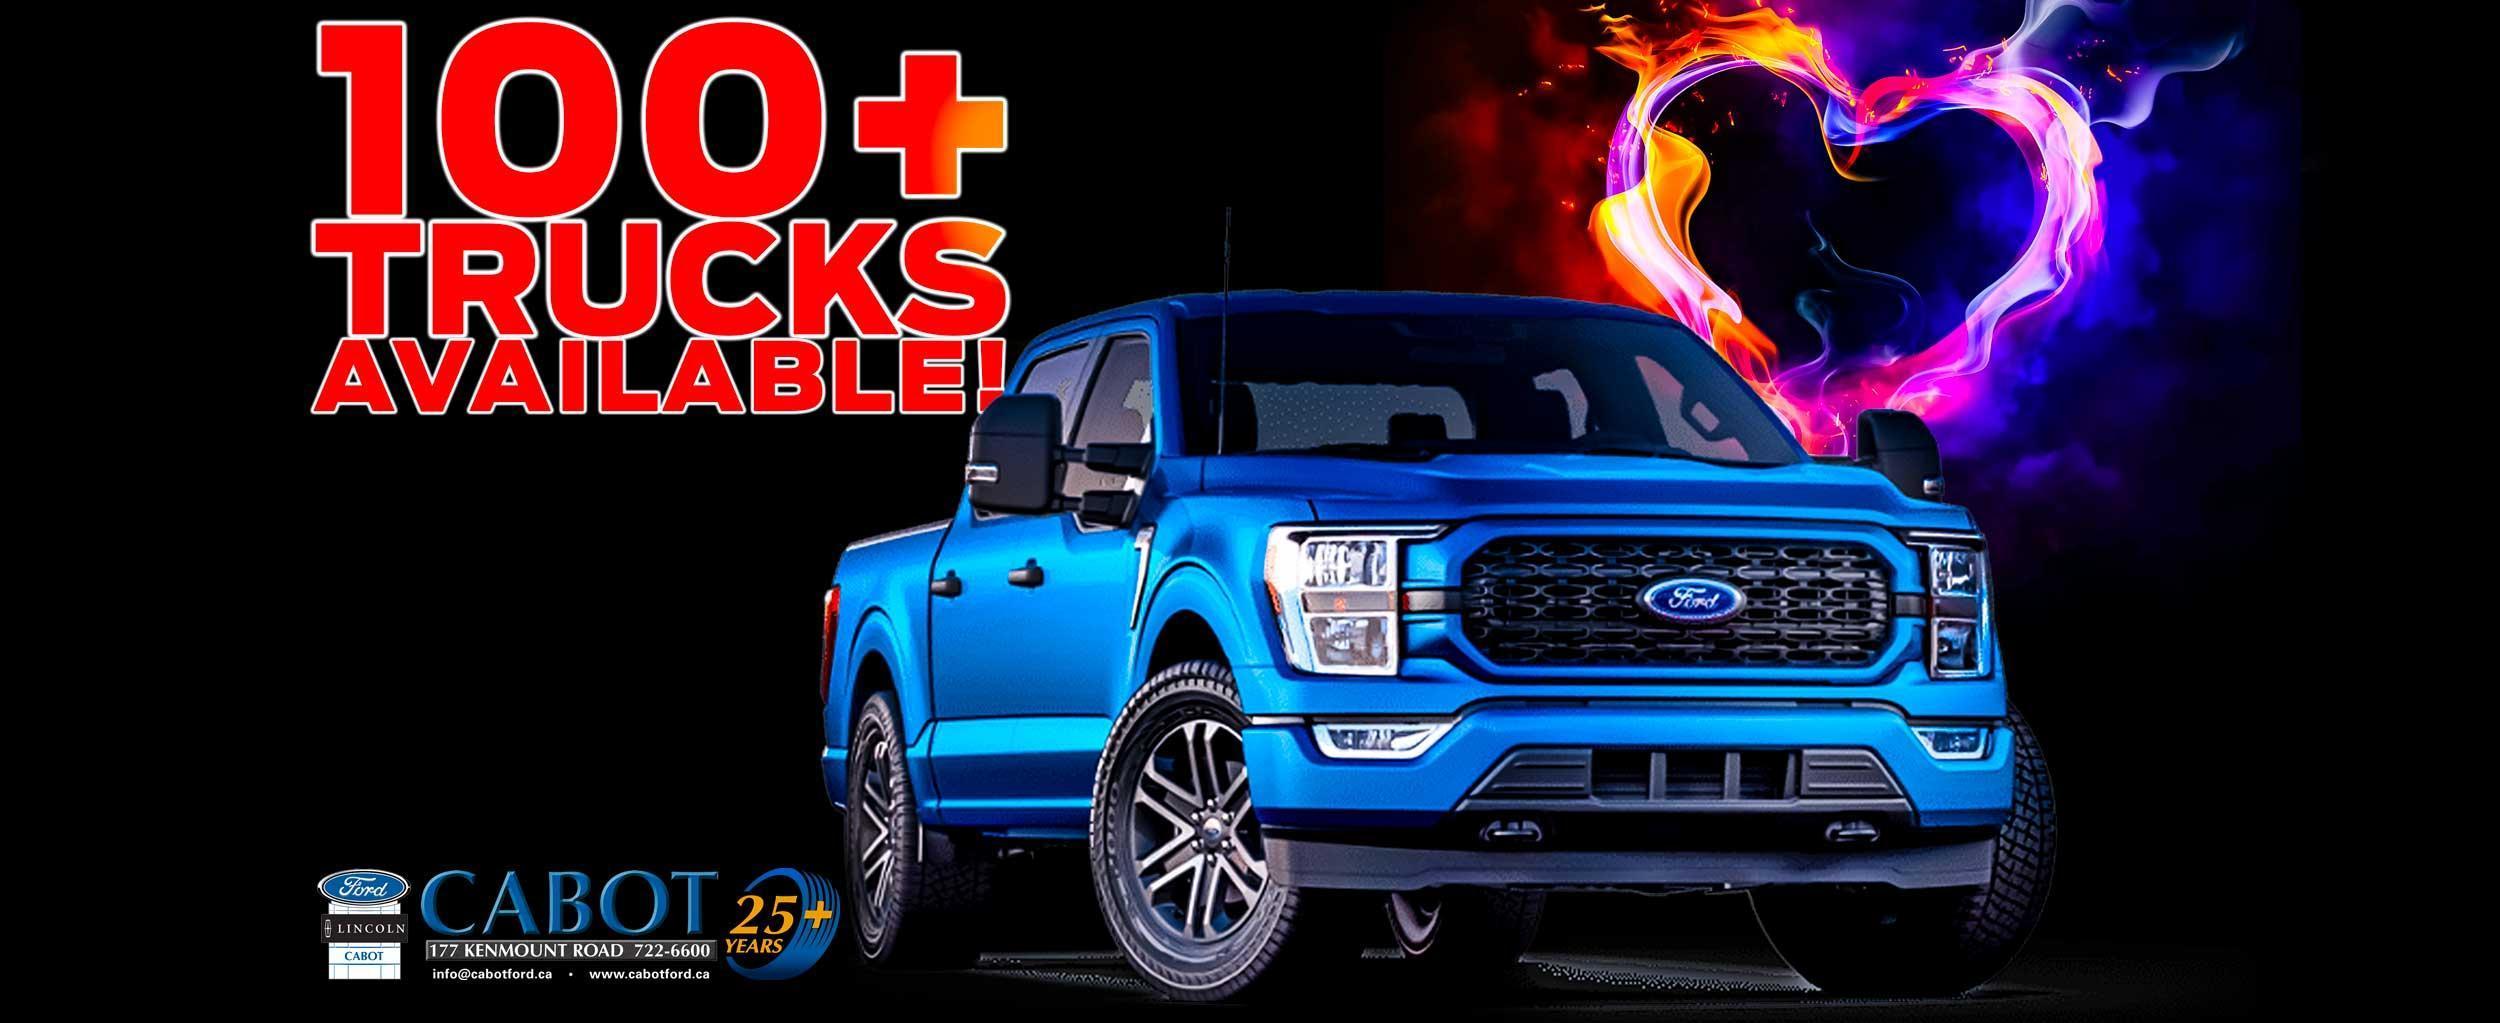 100+ trucks available!